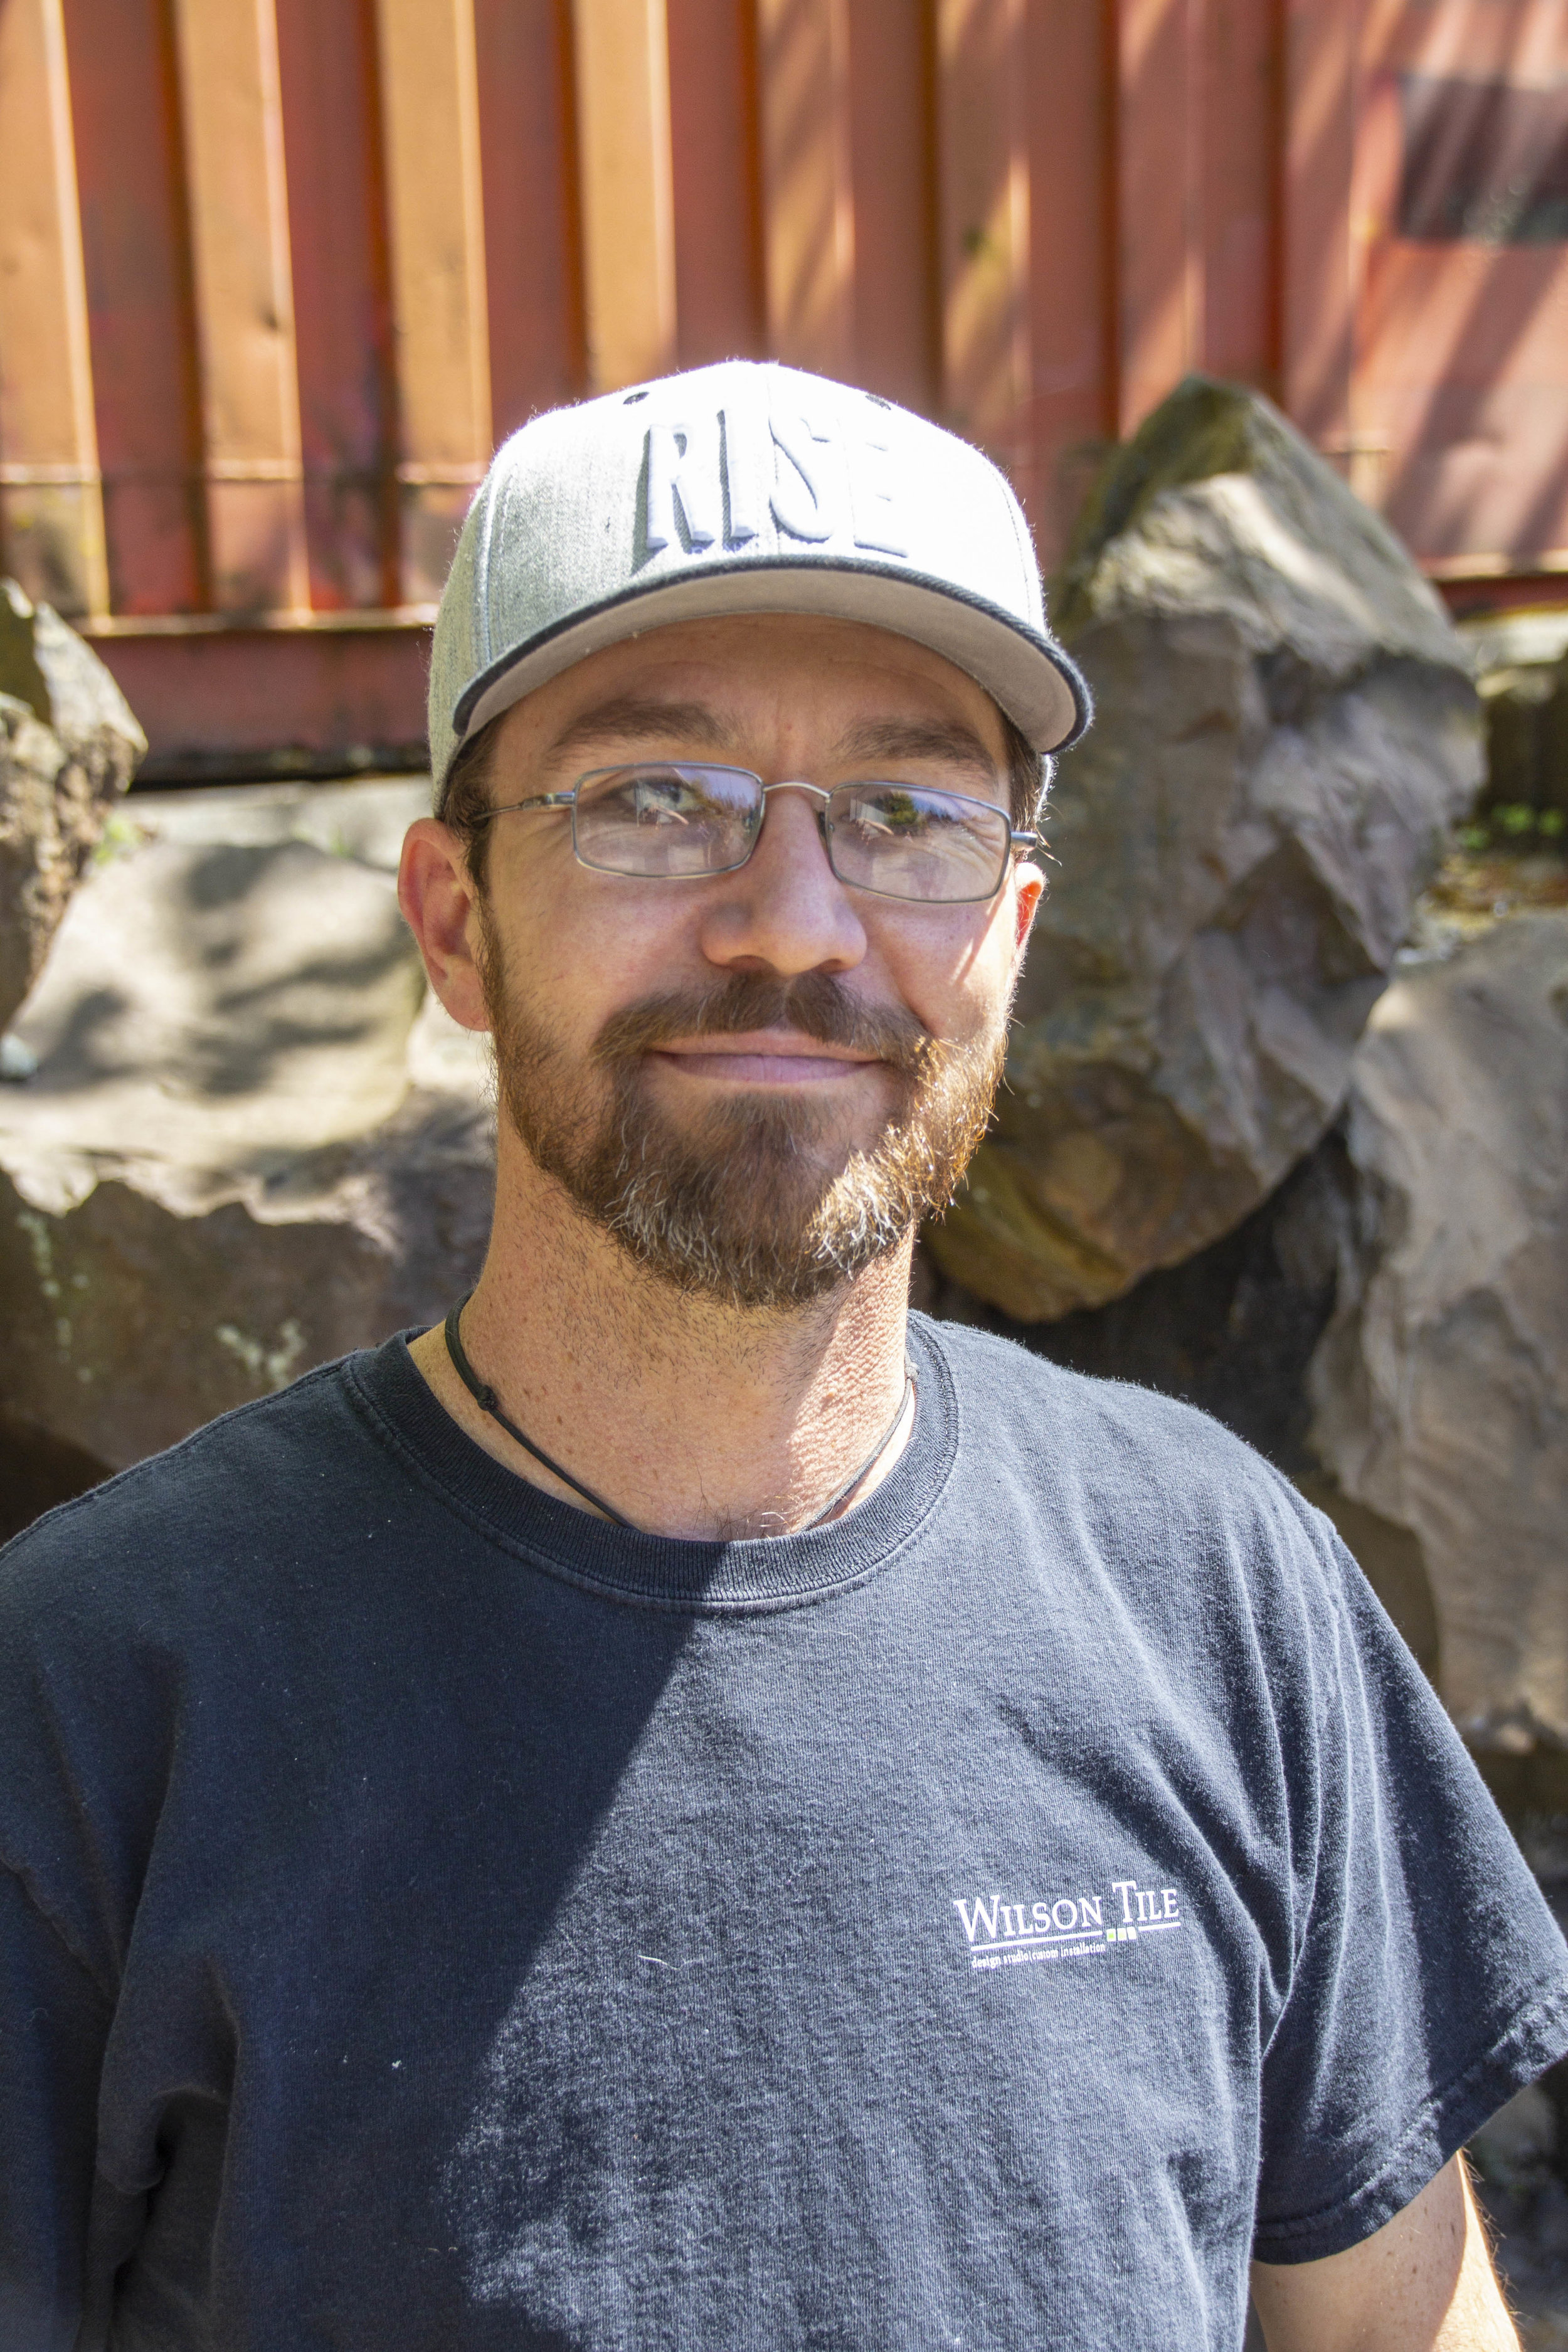 Ryan Rosinski